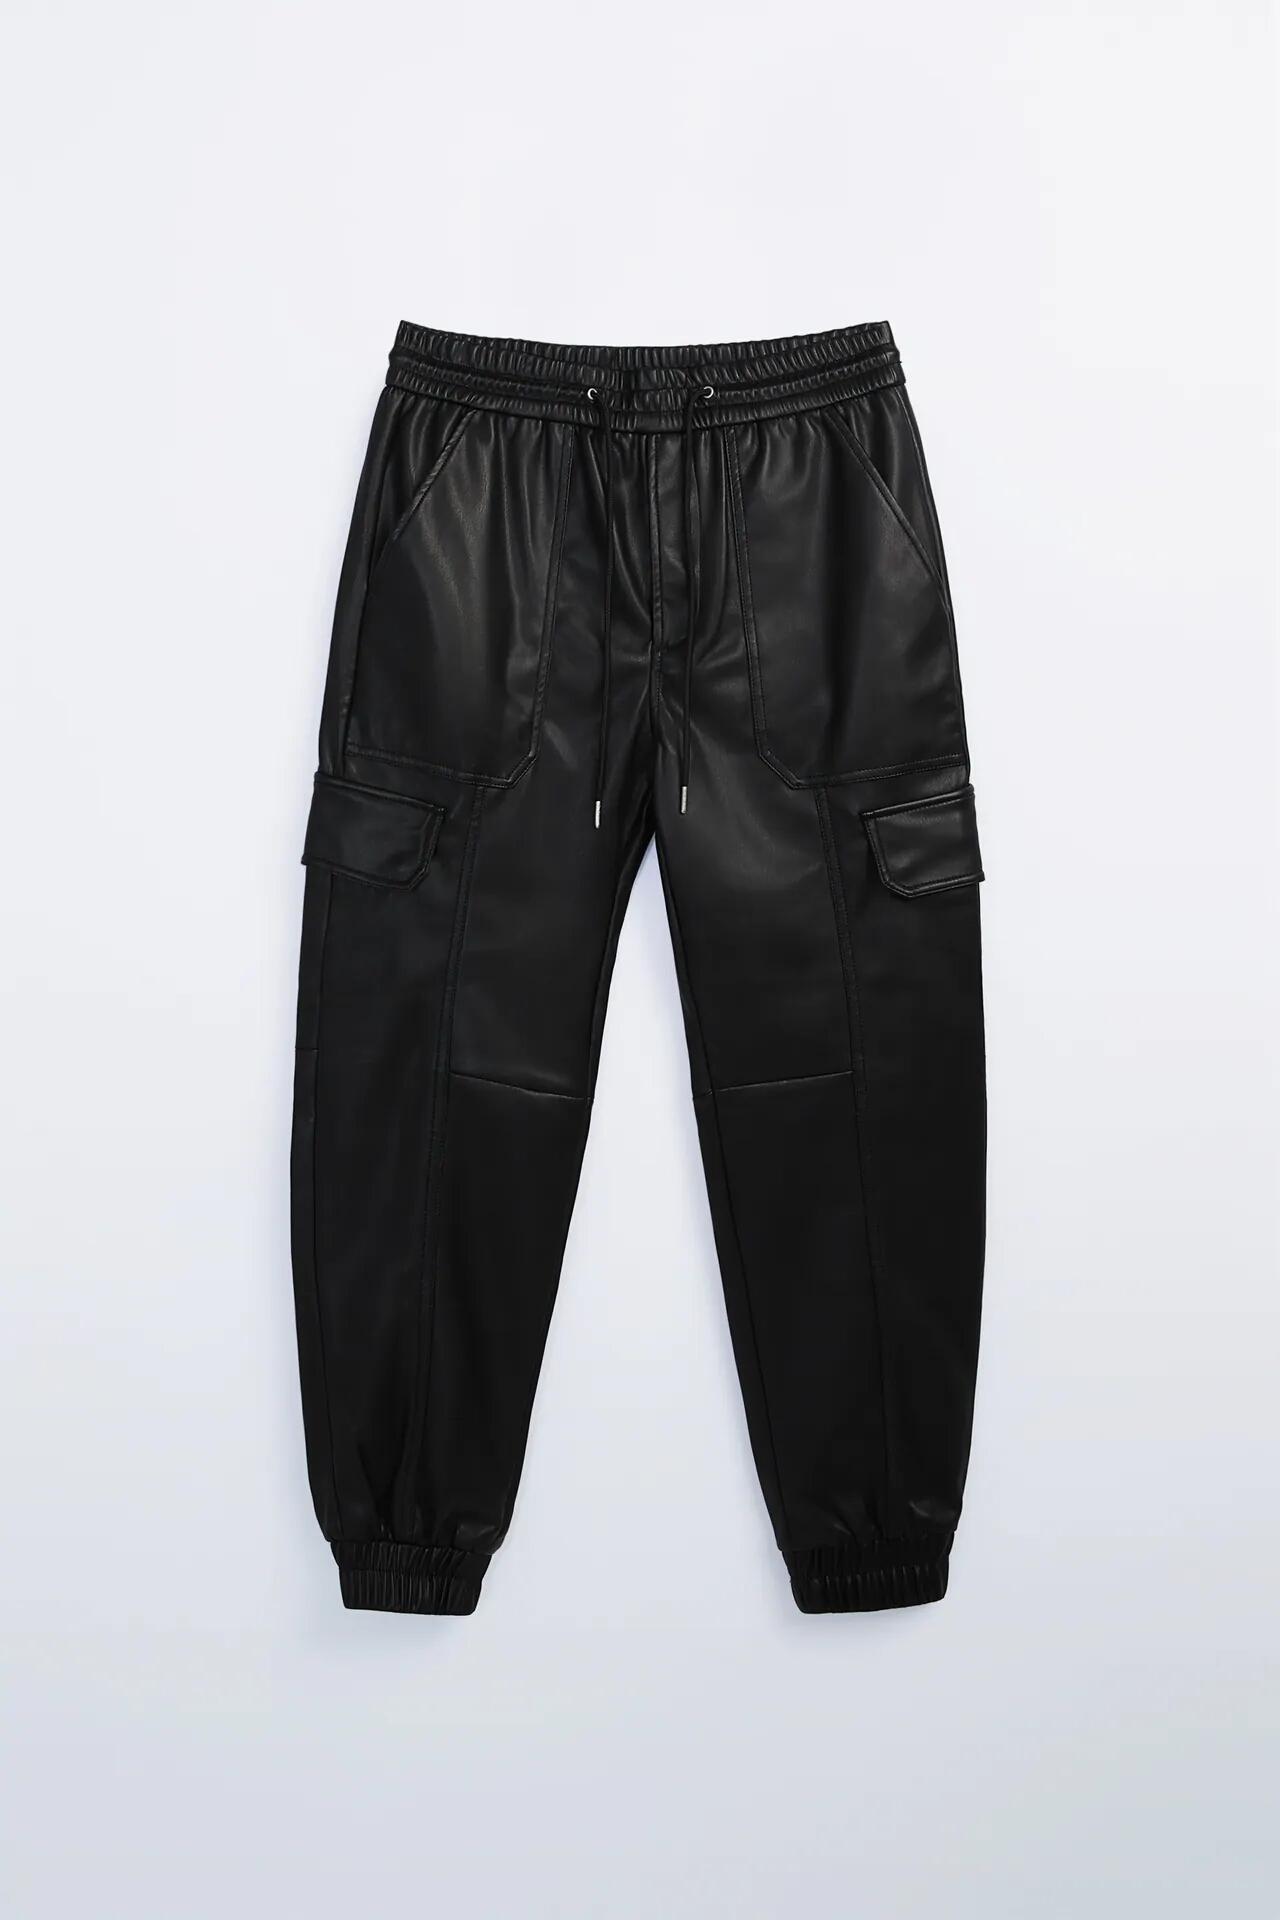 Pantalón tipo cargo de efecto piel